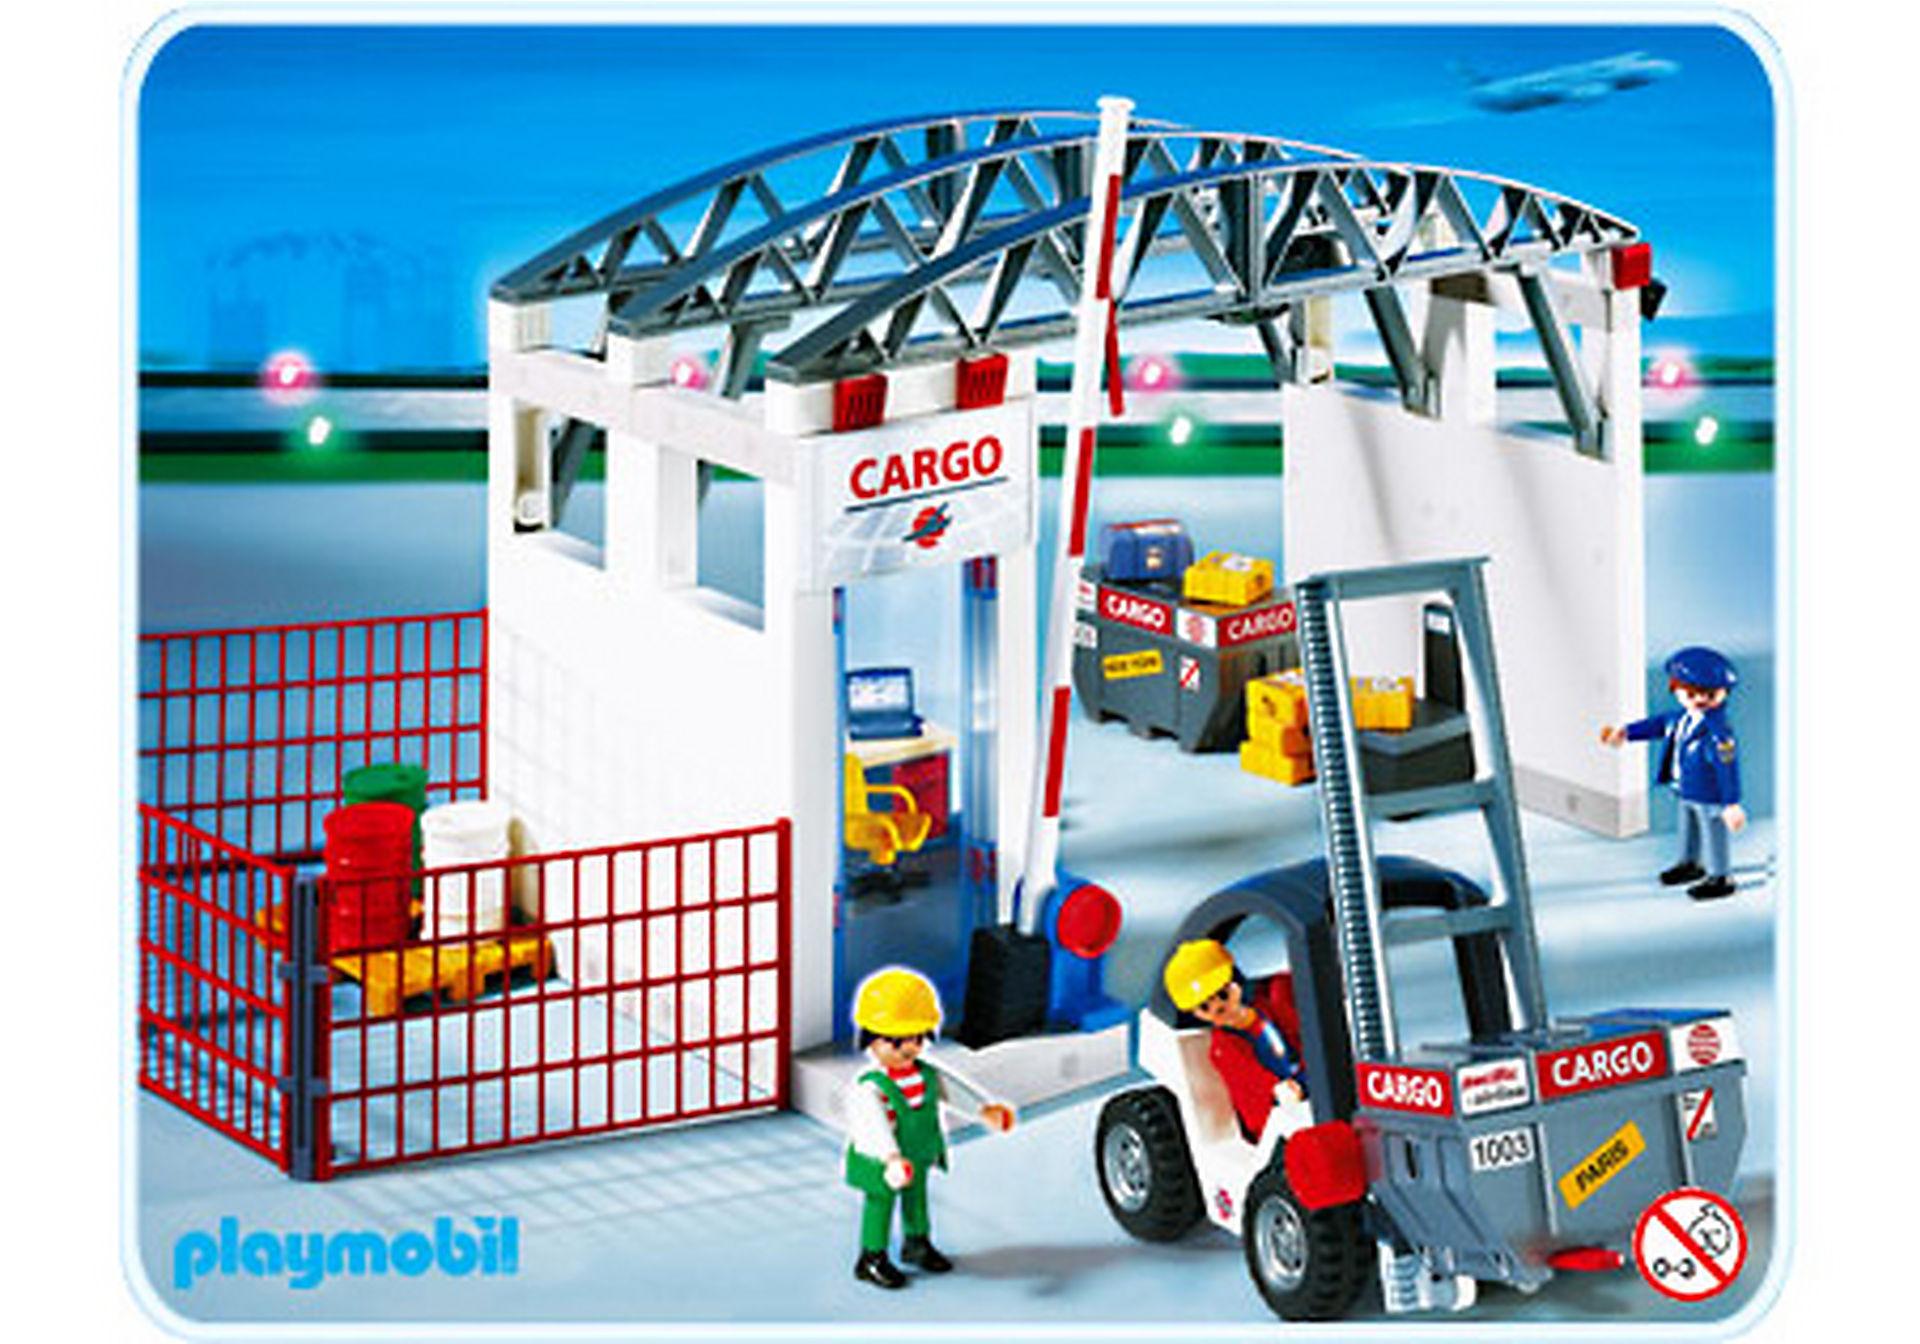 4314-A Cargohalle mit Gabelstapler zoom image1